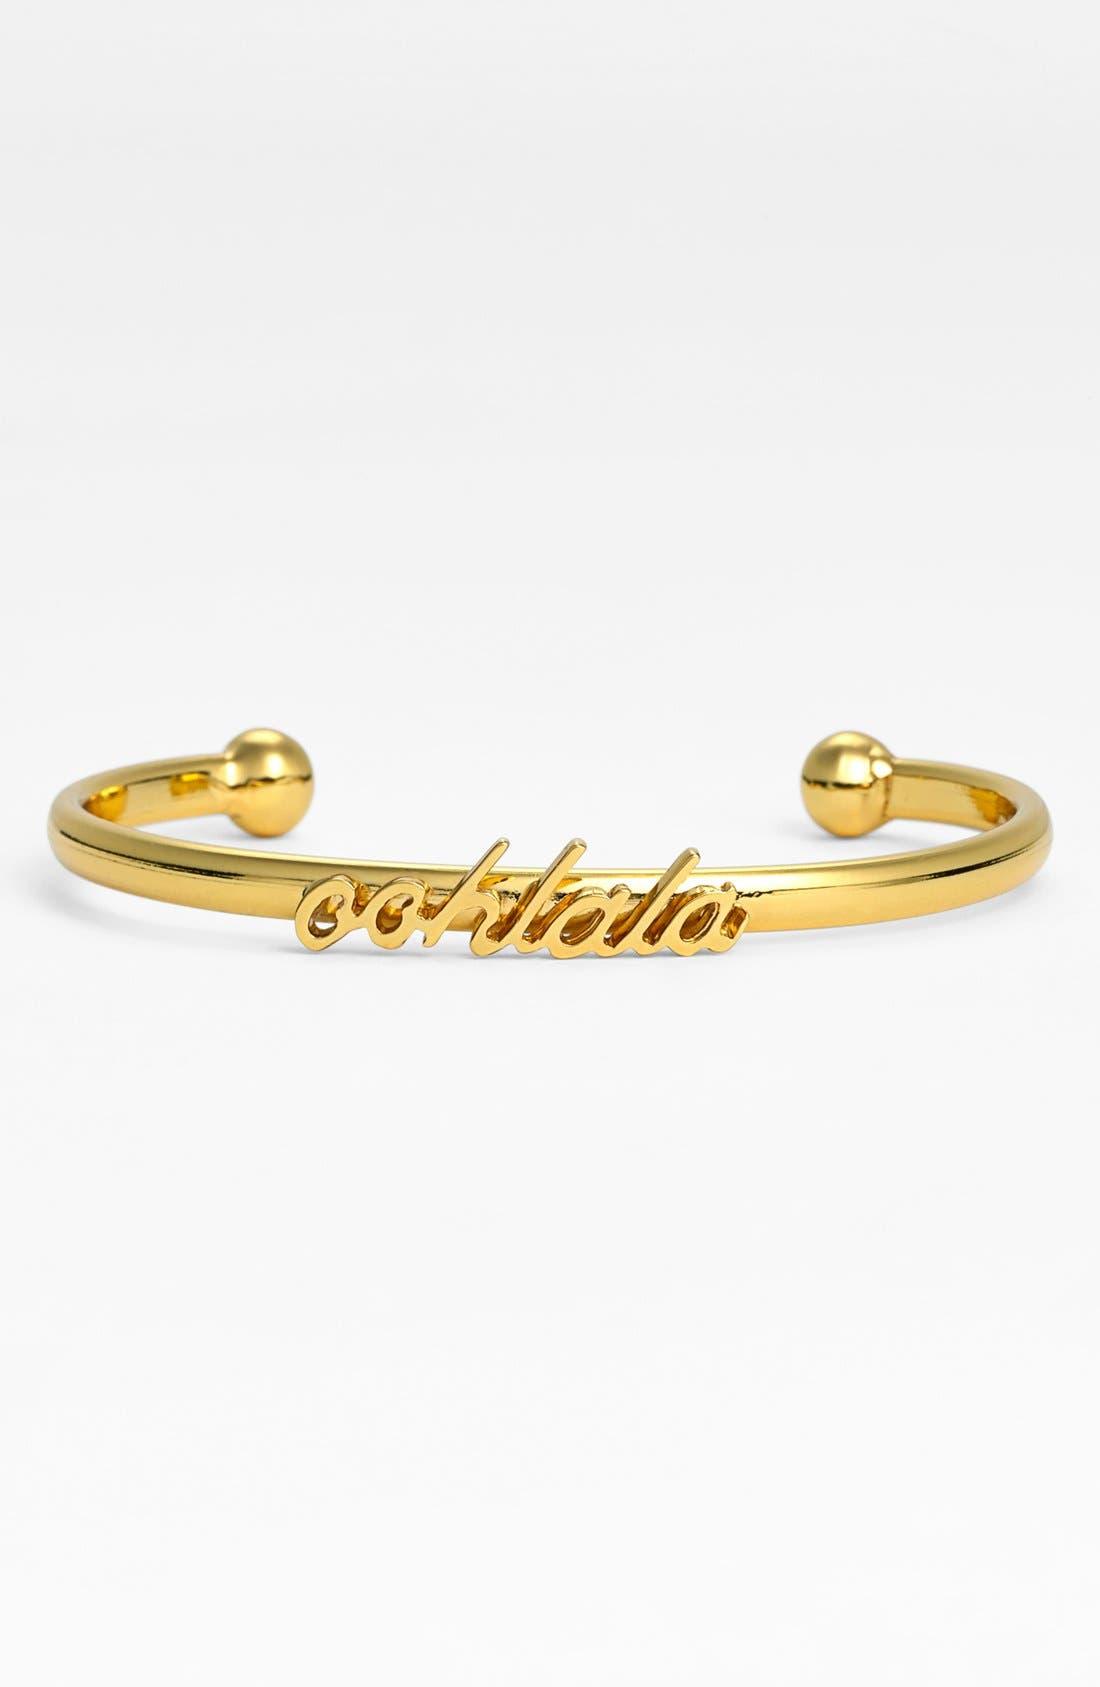 Main Image - kate spade new york 'ooh la la' script cuff bracelet